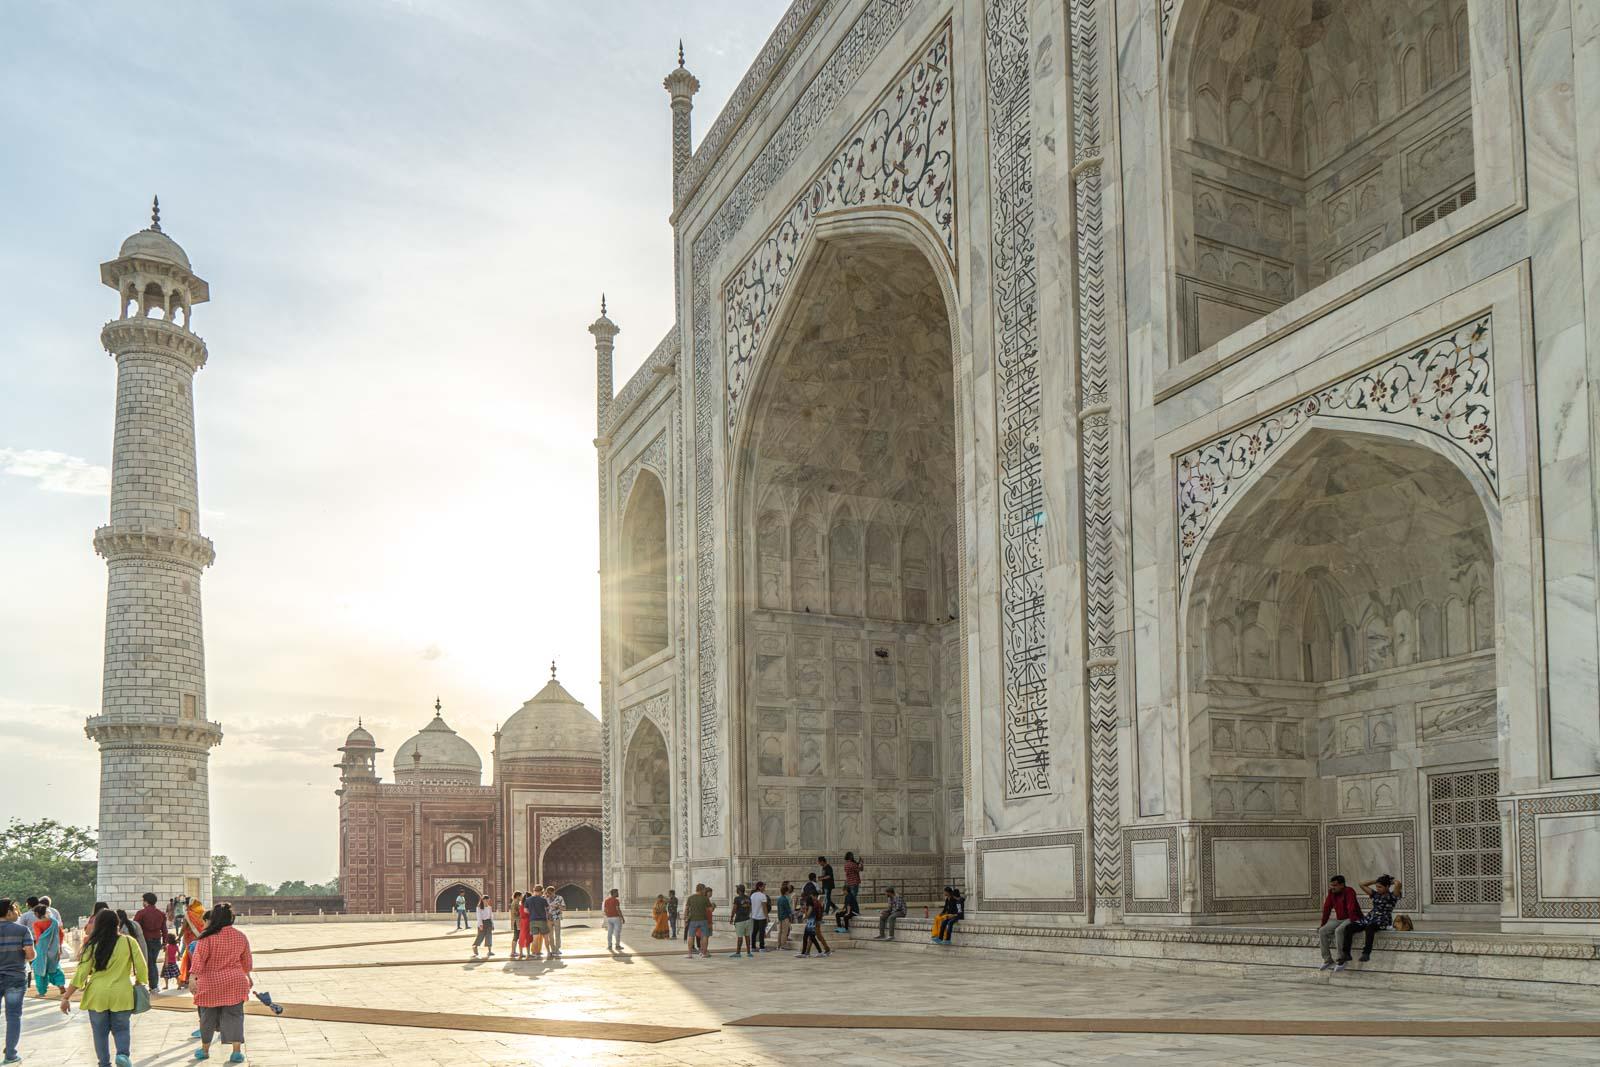 Visiting the Taj Mahal, India